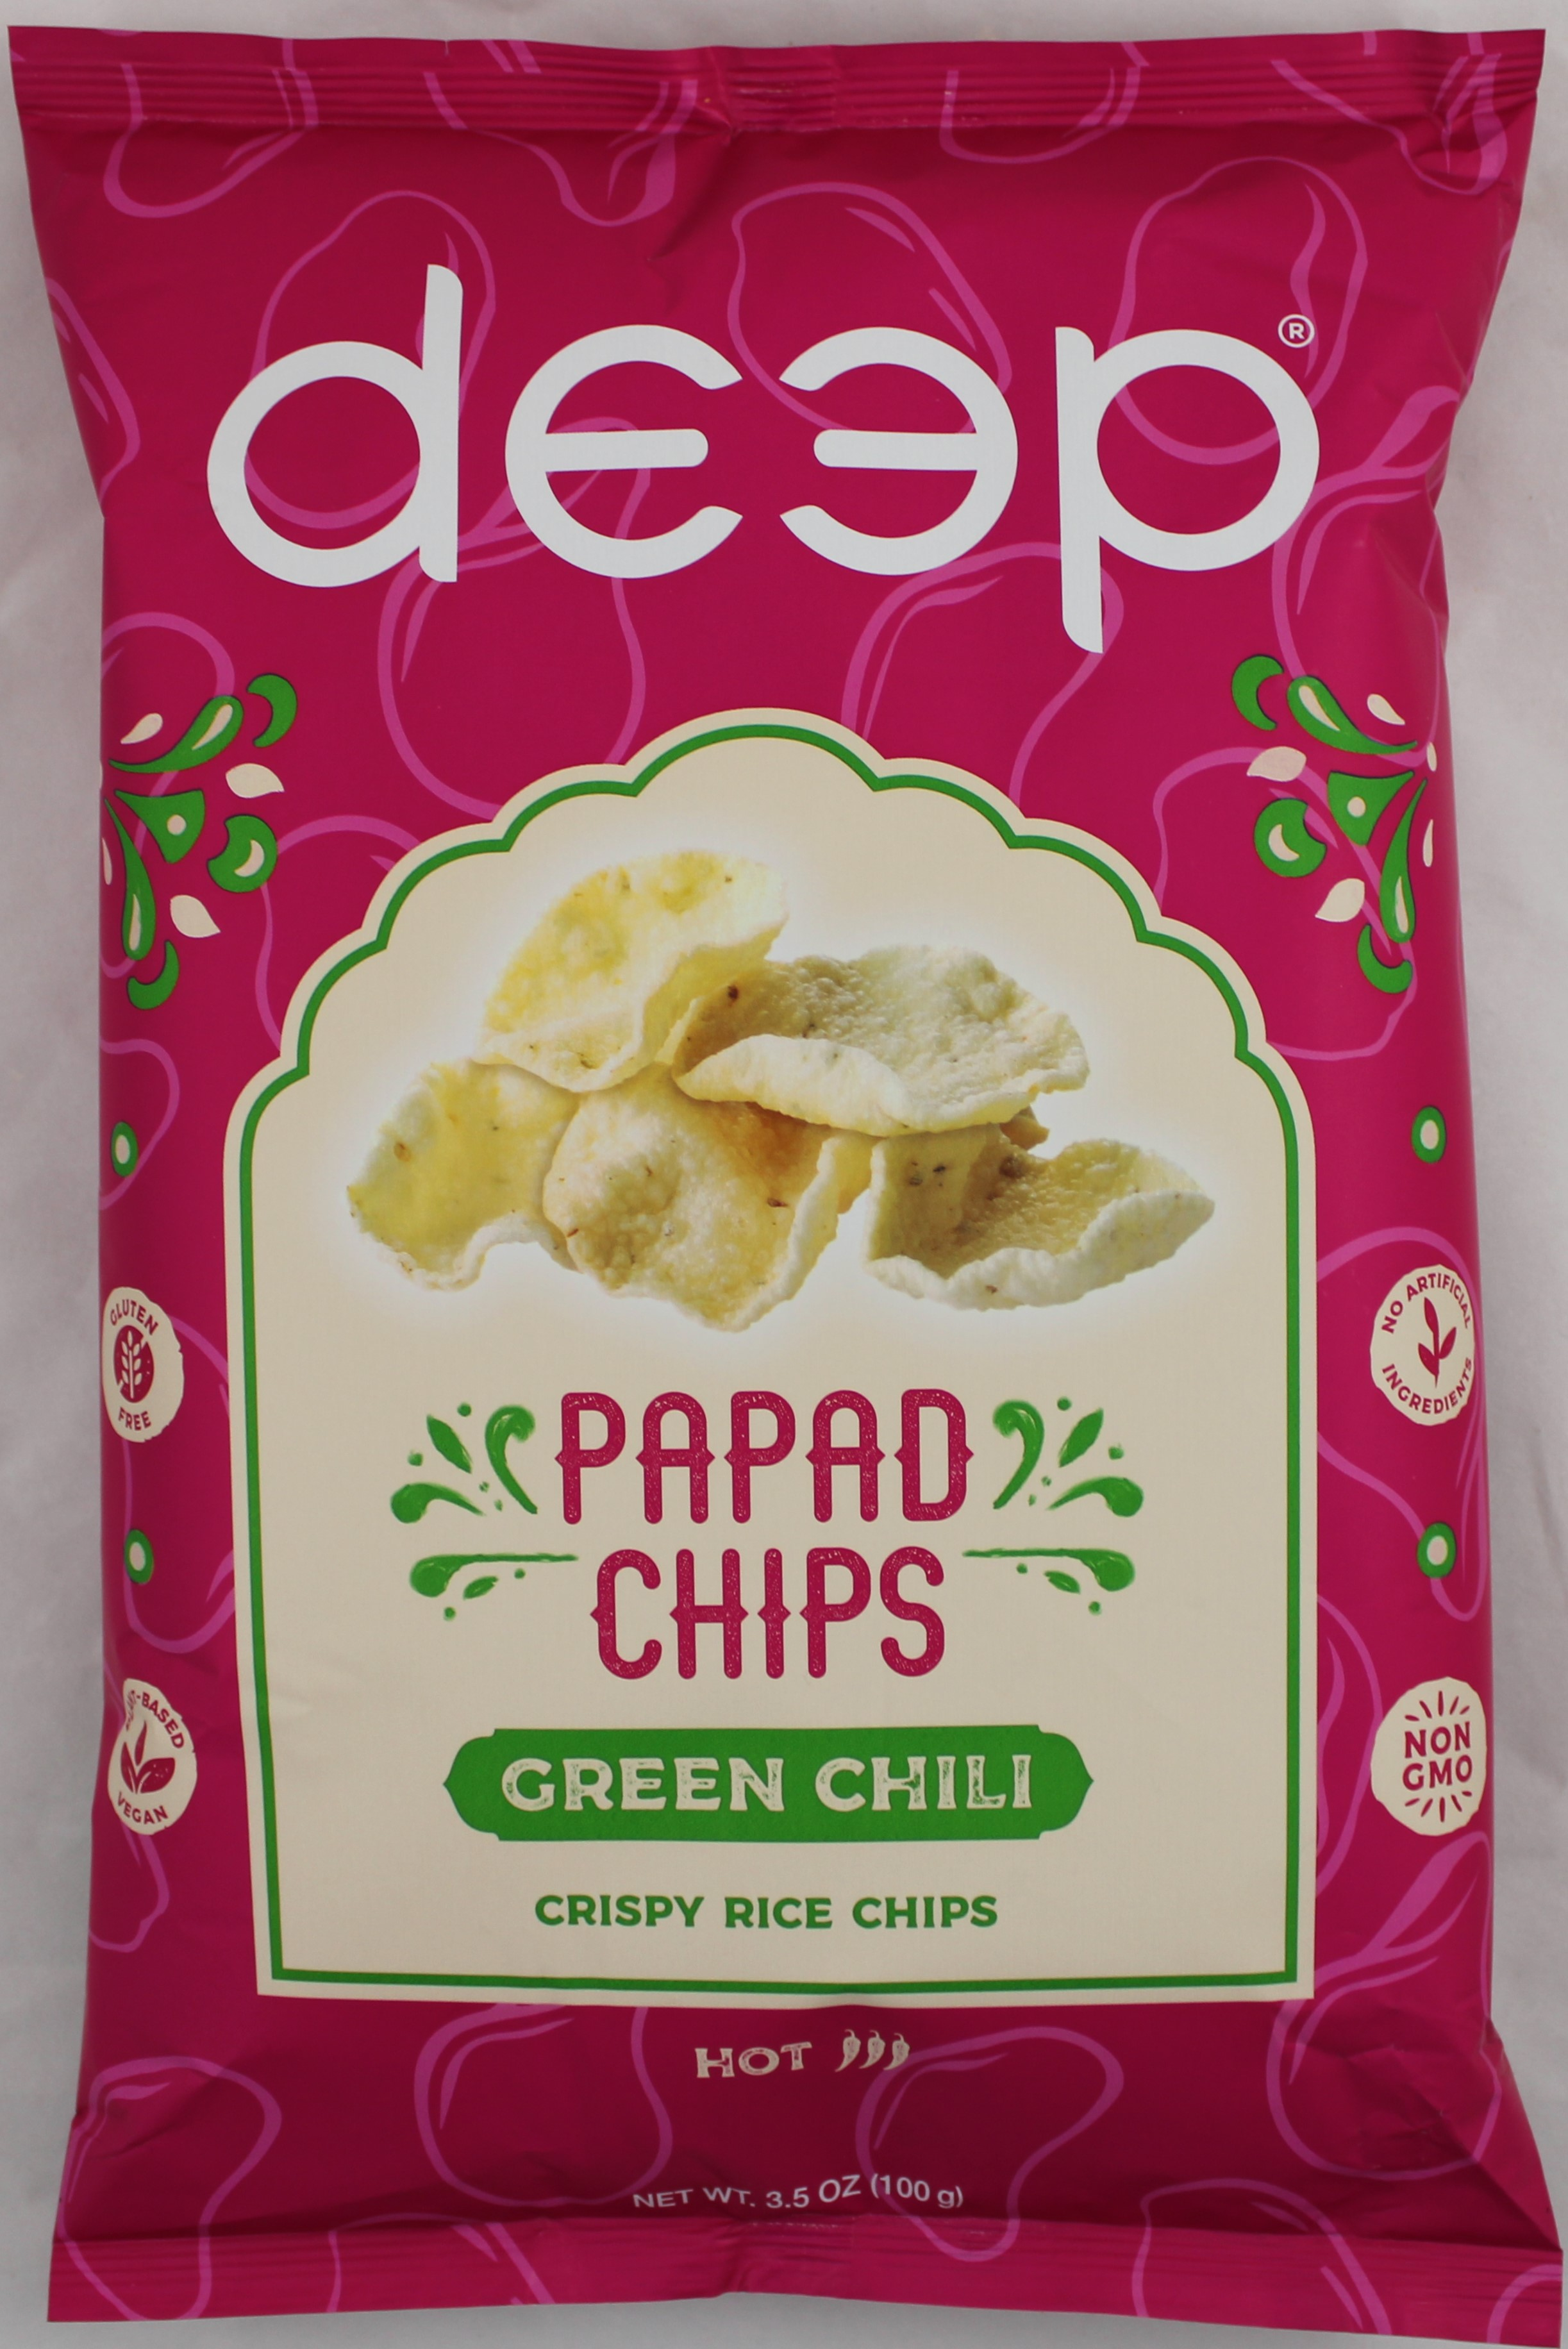 Green Chilli  Papad Chips 3.5oz